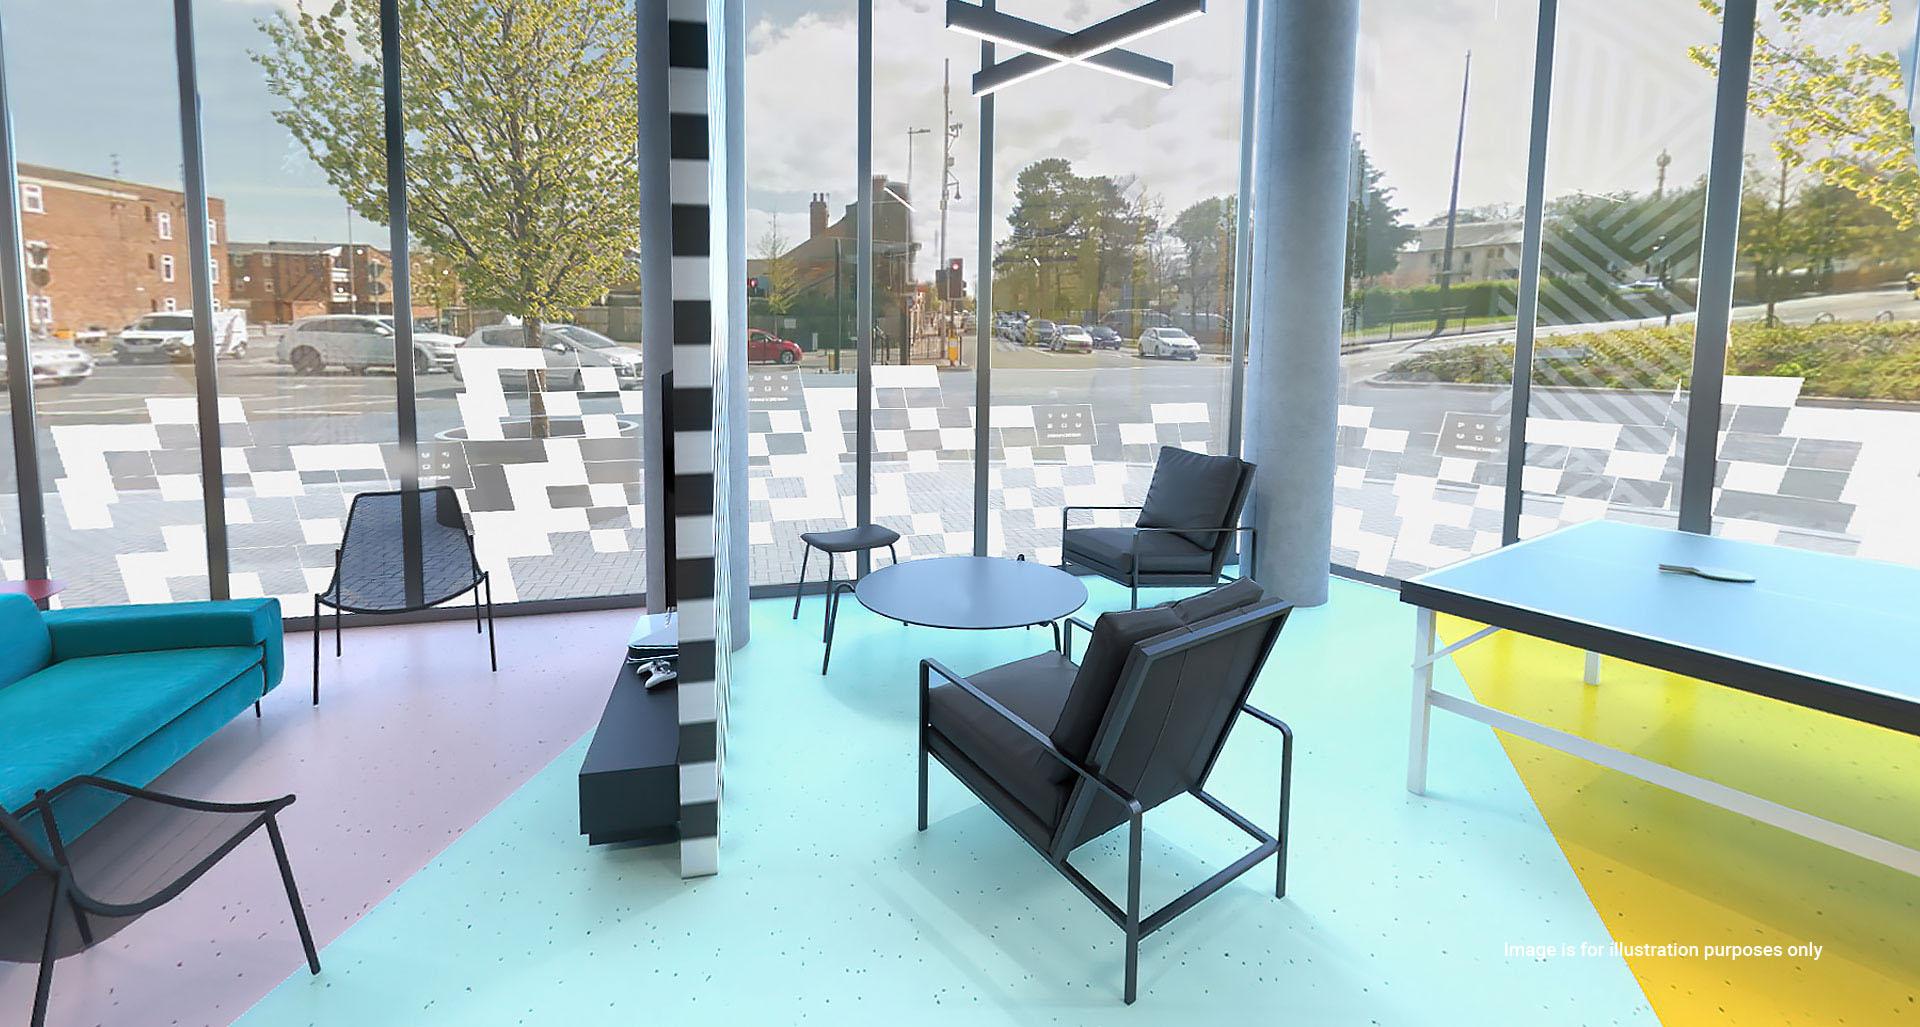 Luxurio student accommodation games area 2